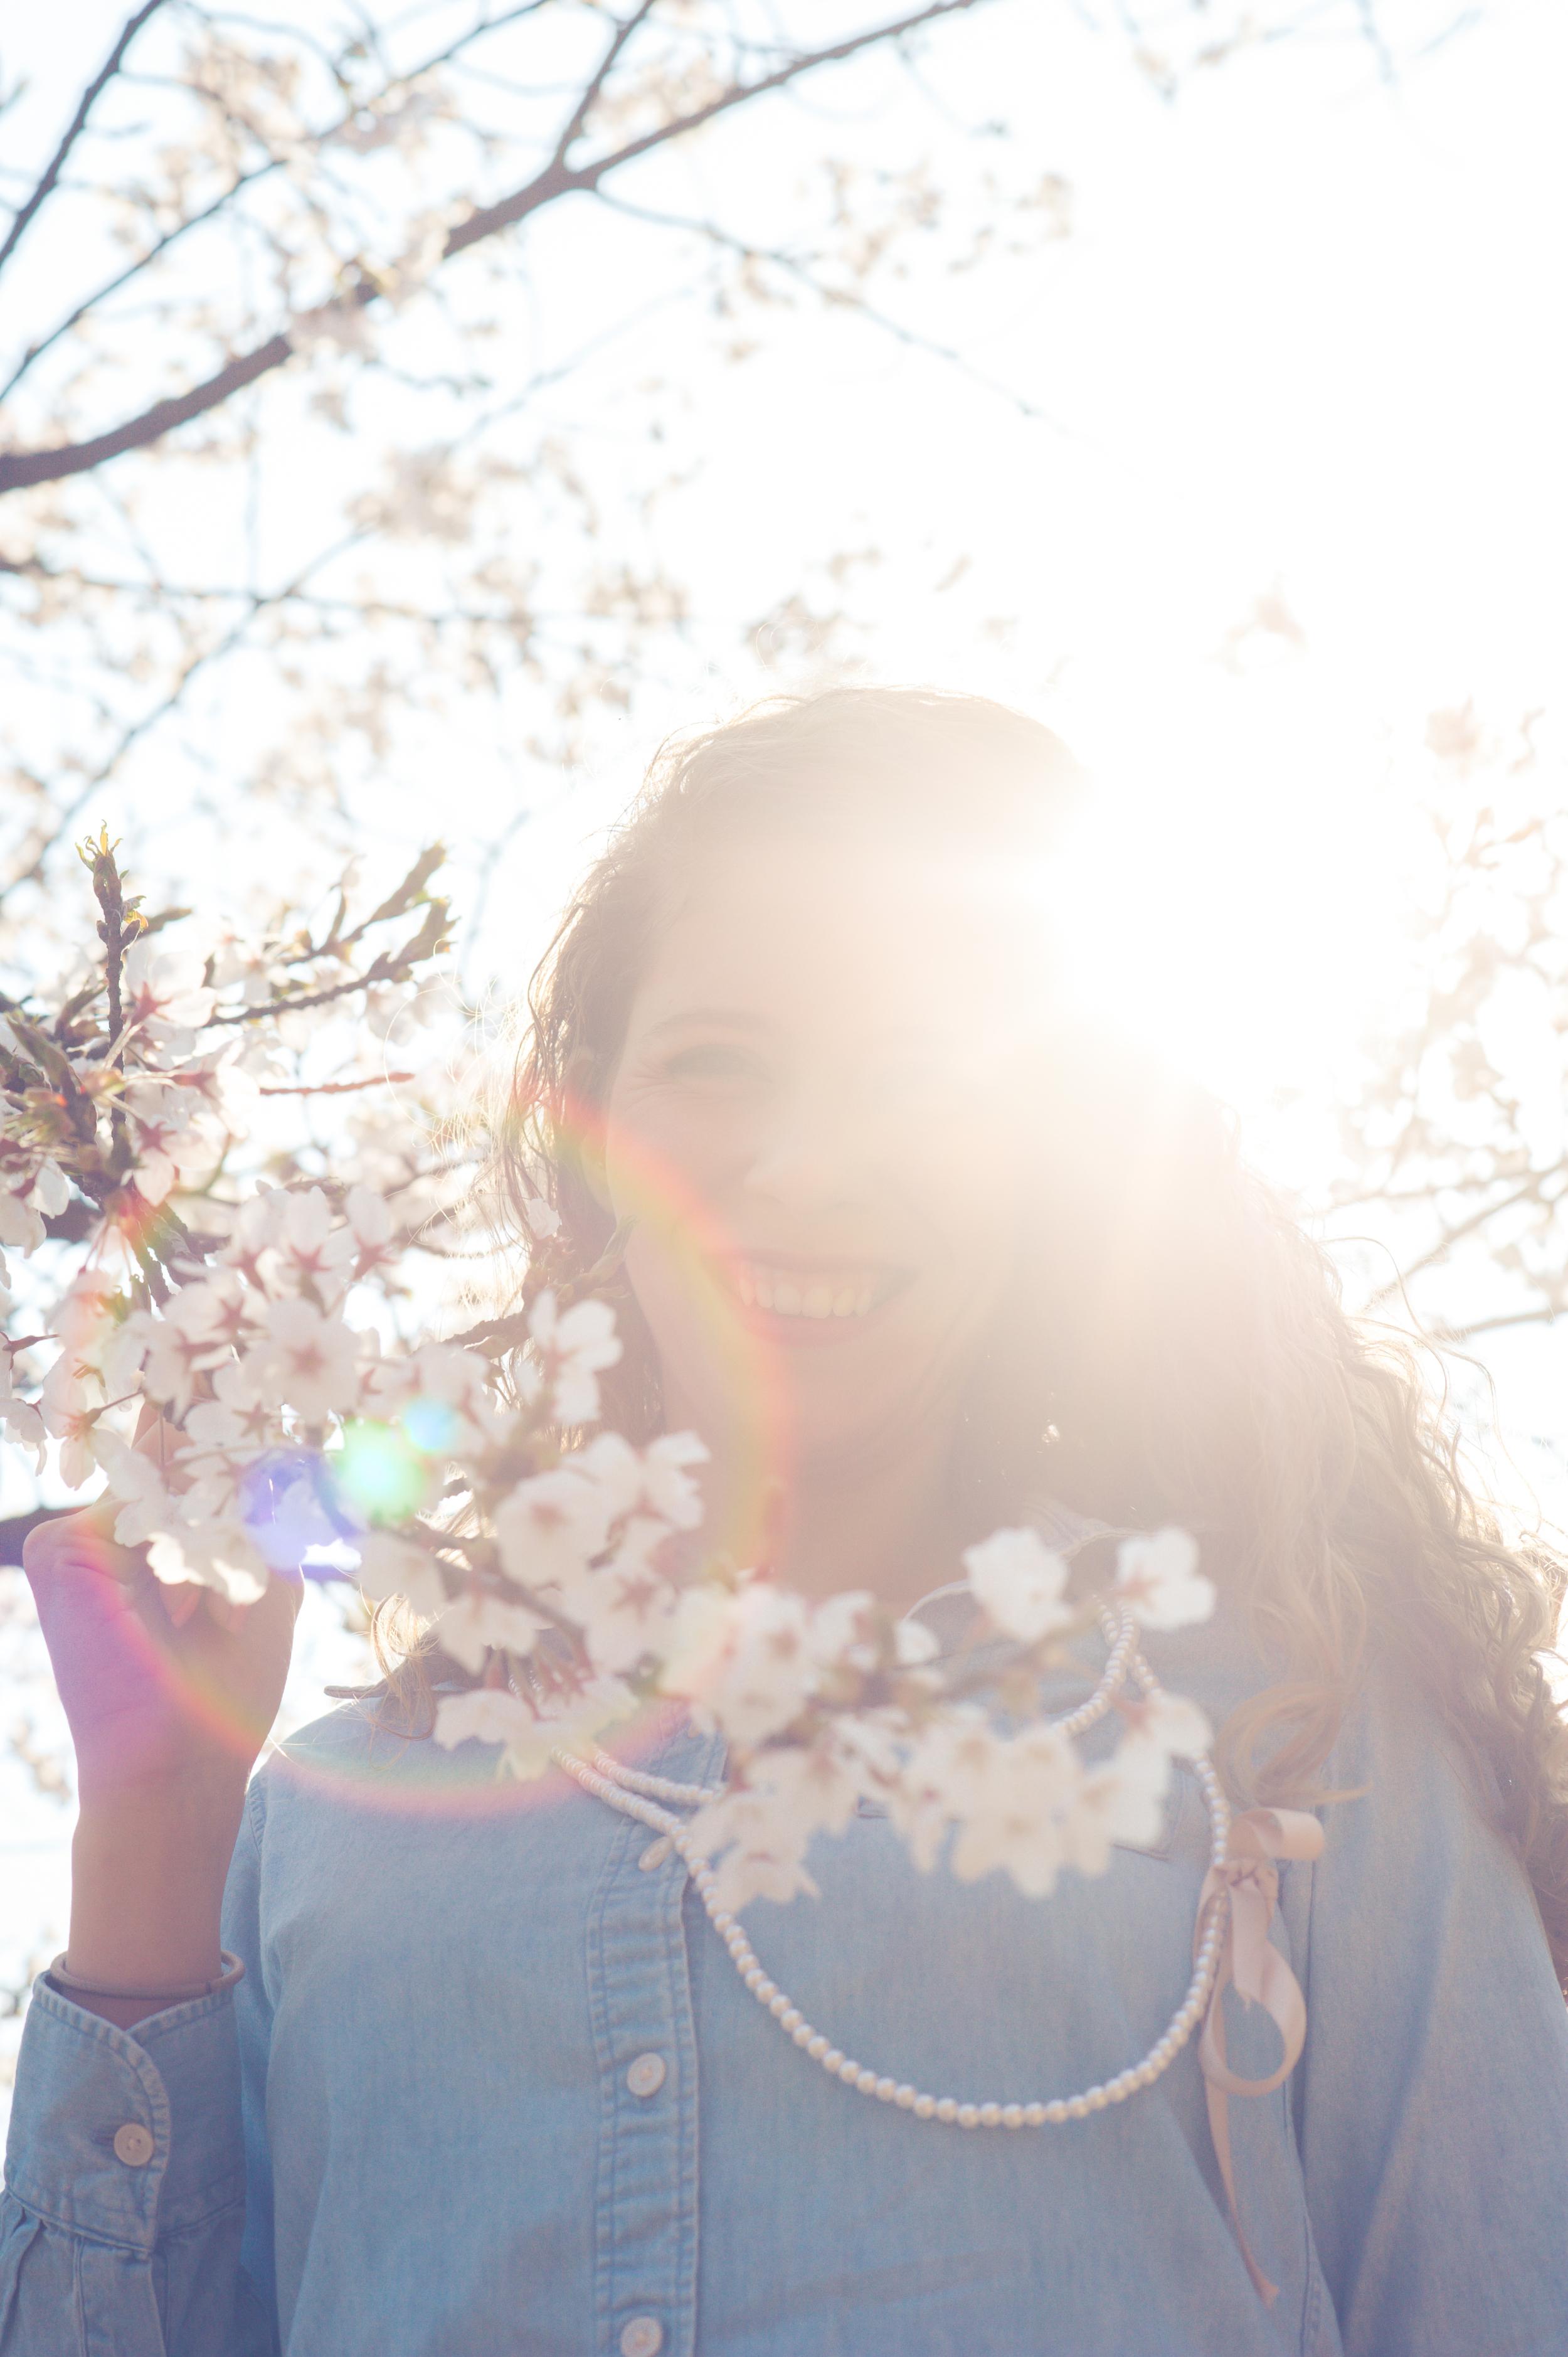 CherryBlossomStyledShootKoreaAlyshaCGSPhotography (23 of 57).jpg